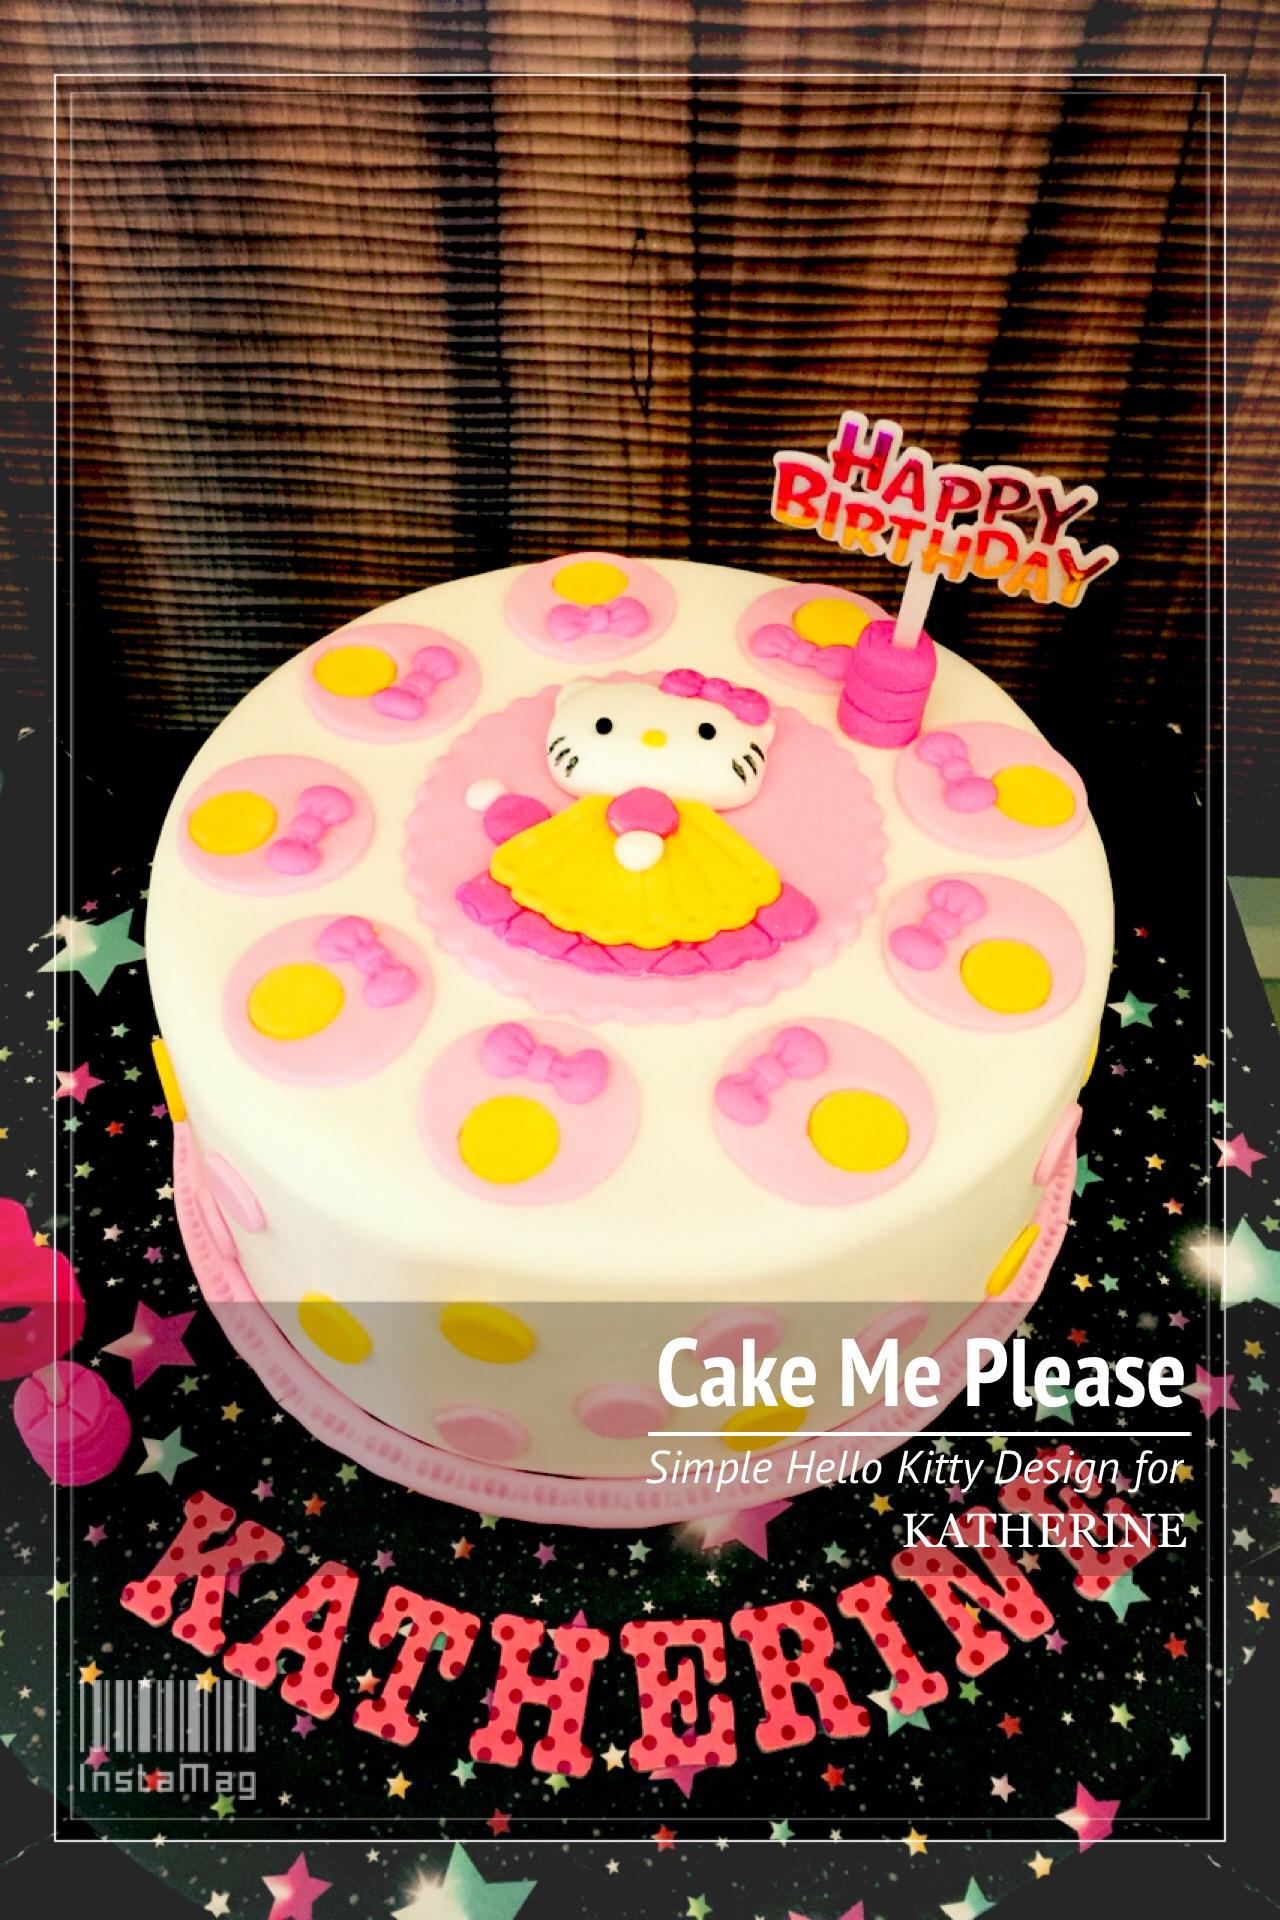 Cake Me Please